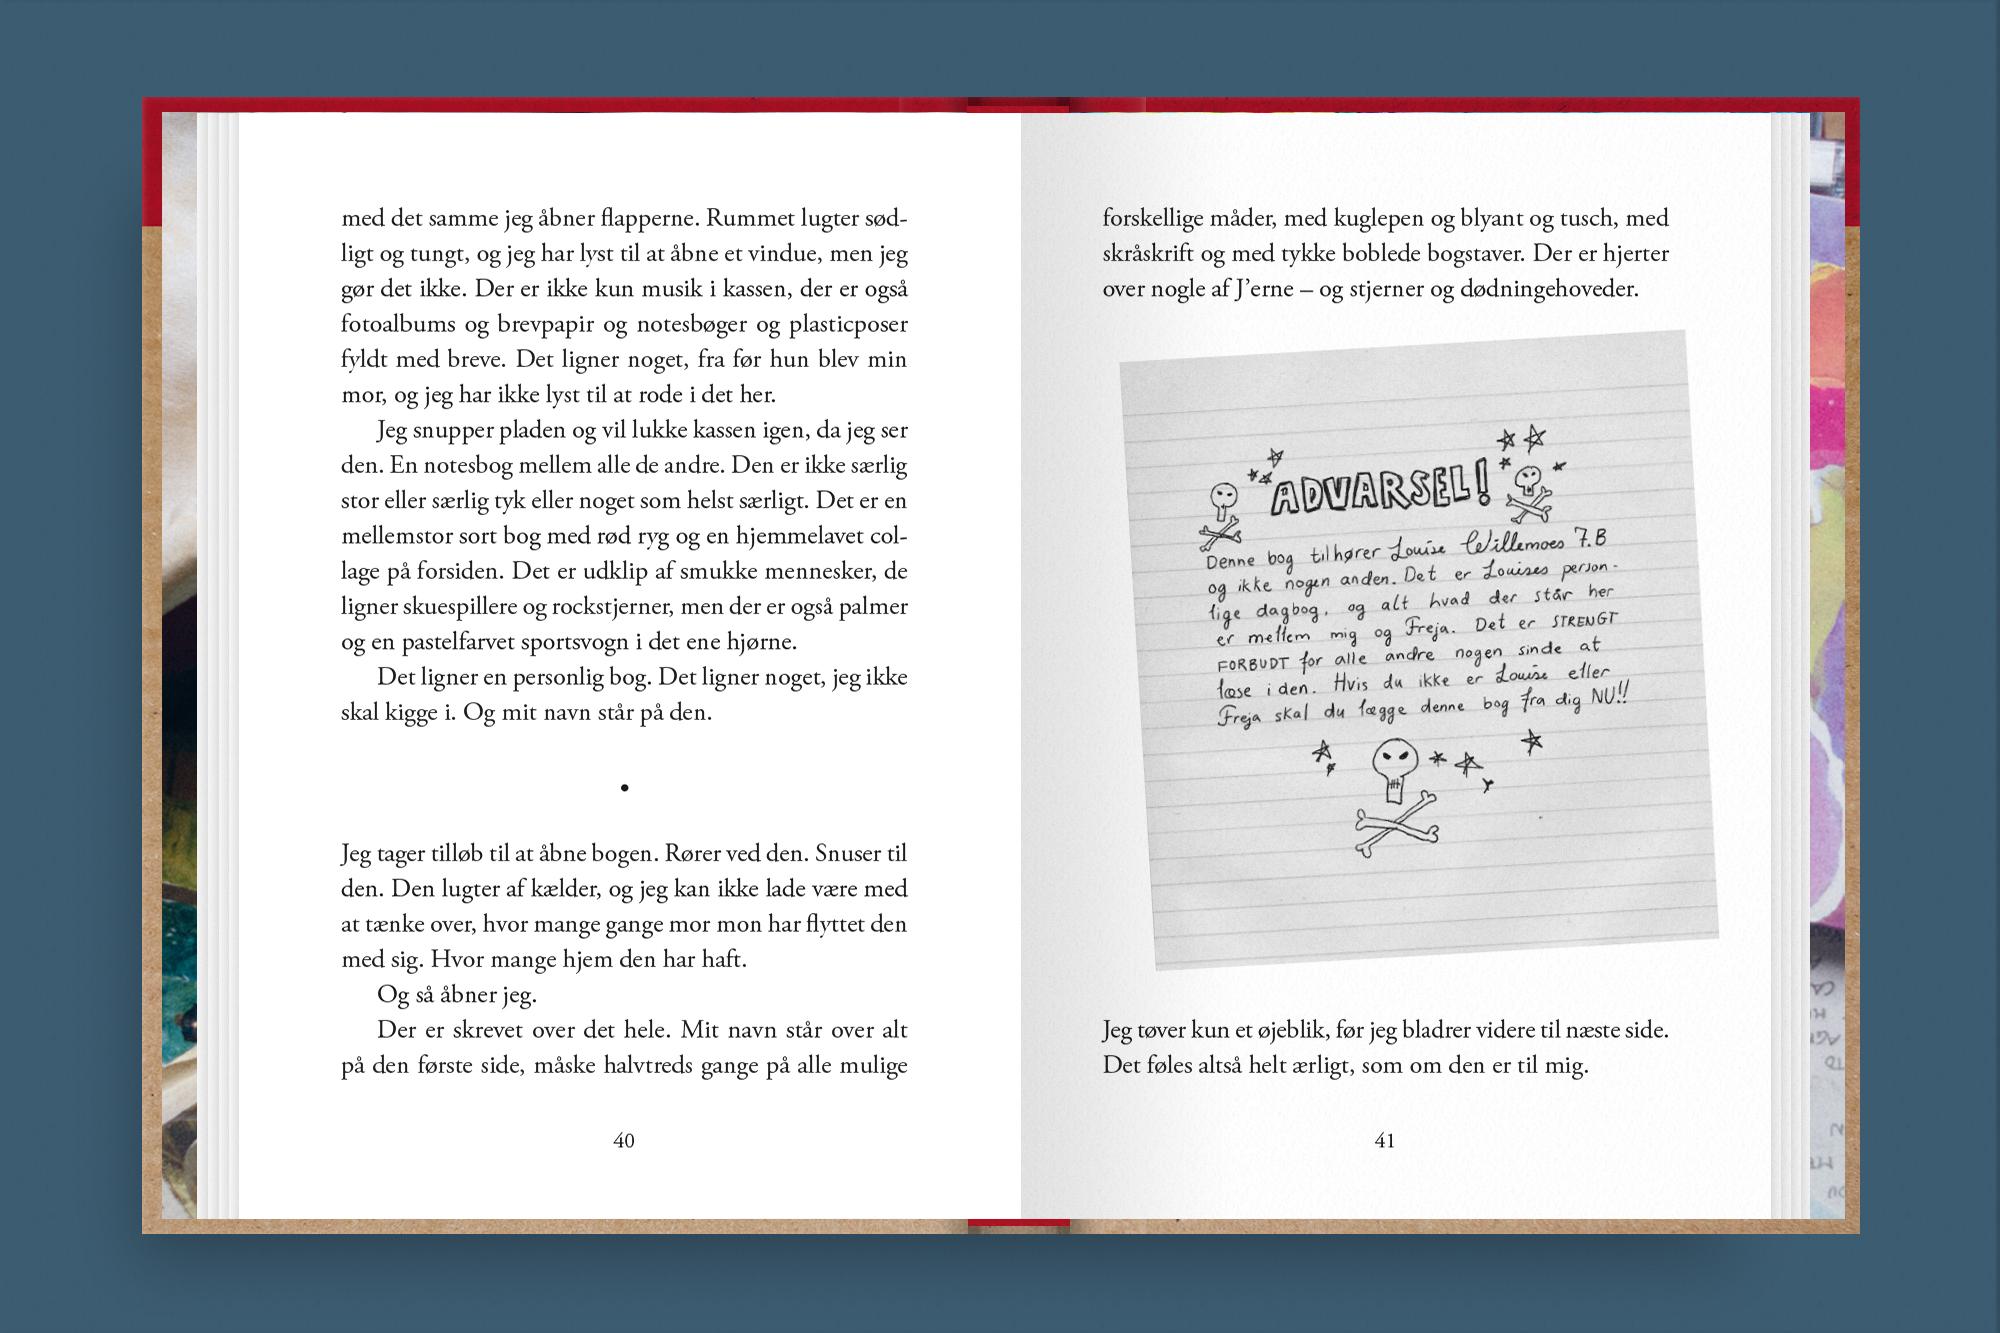 kaere-freja-bogdesign-bogomslag-malene-hald-4